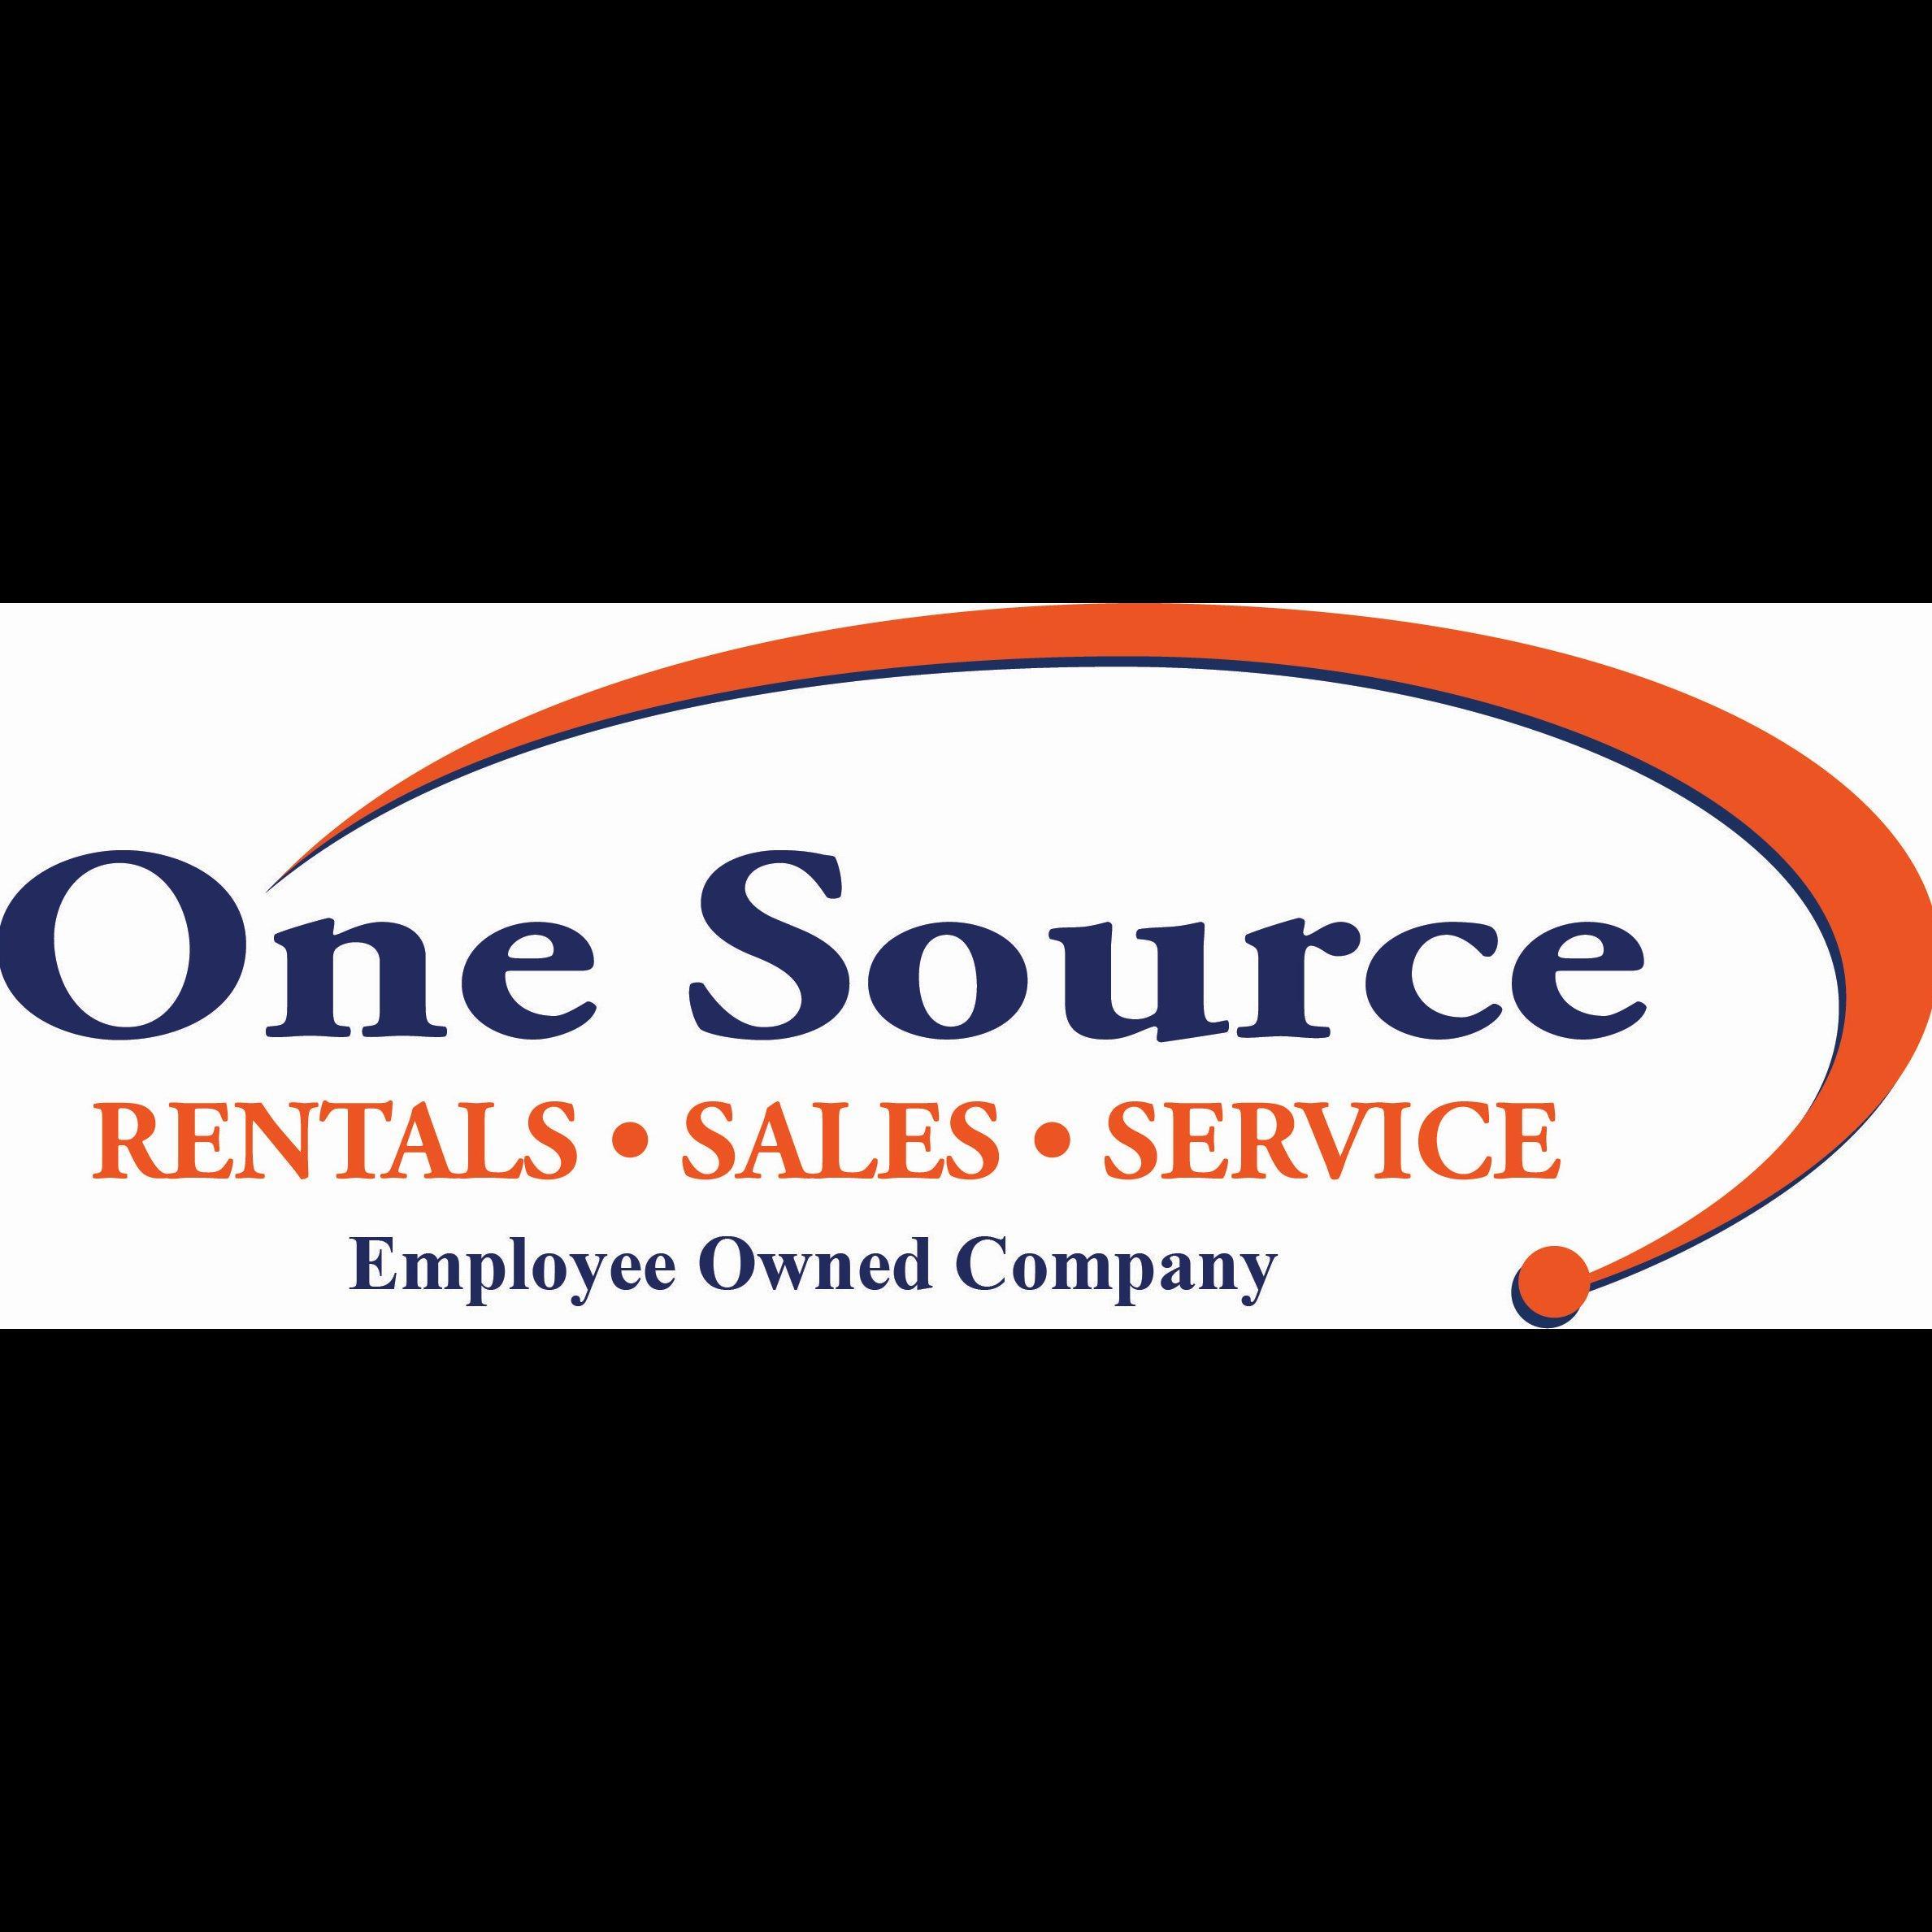 One Source Equipment Rentals, Inc.